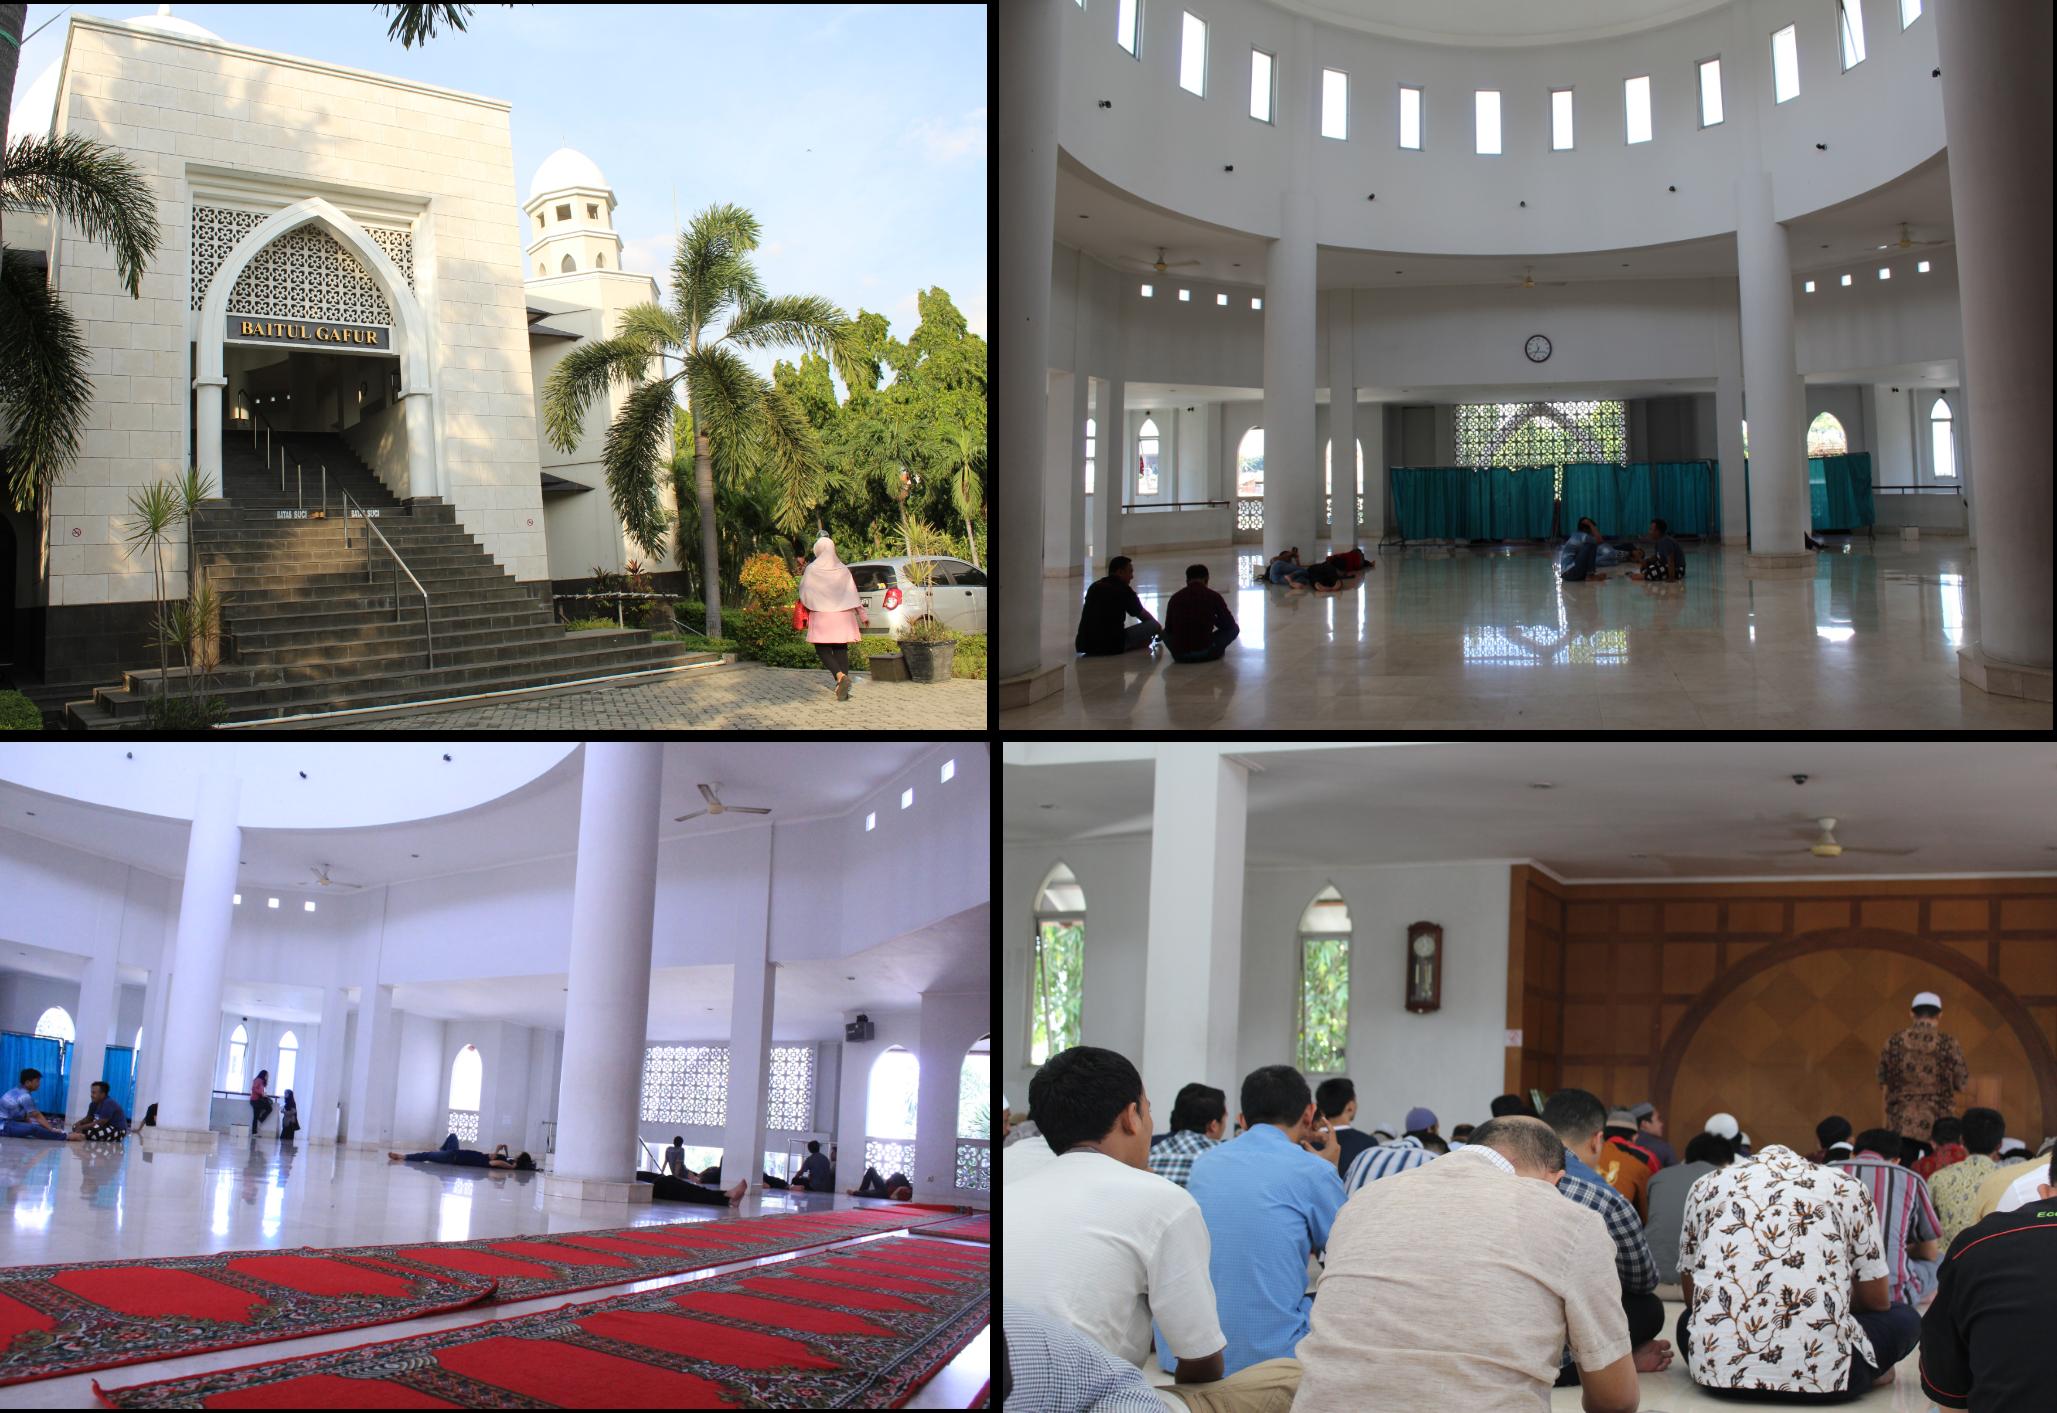 Suasana Masjid Baitul Gafur